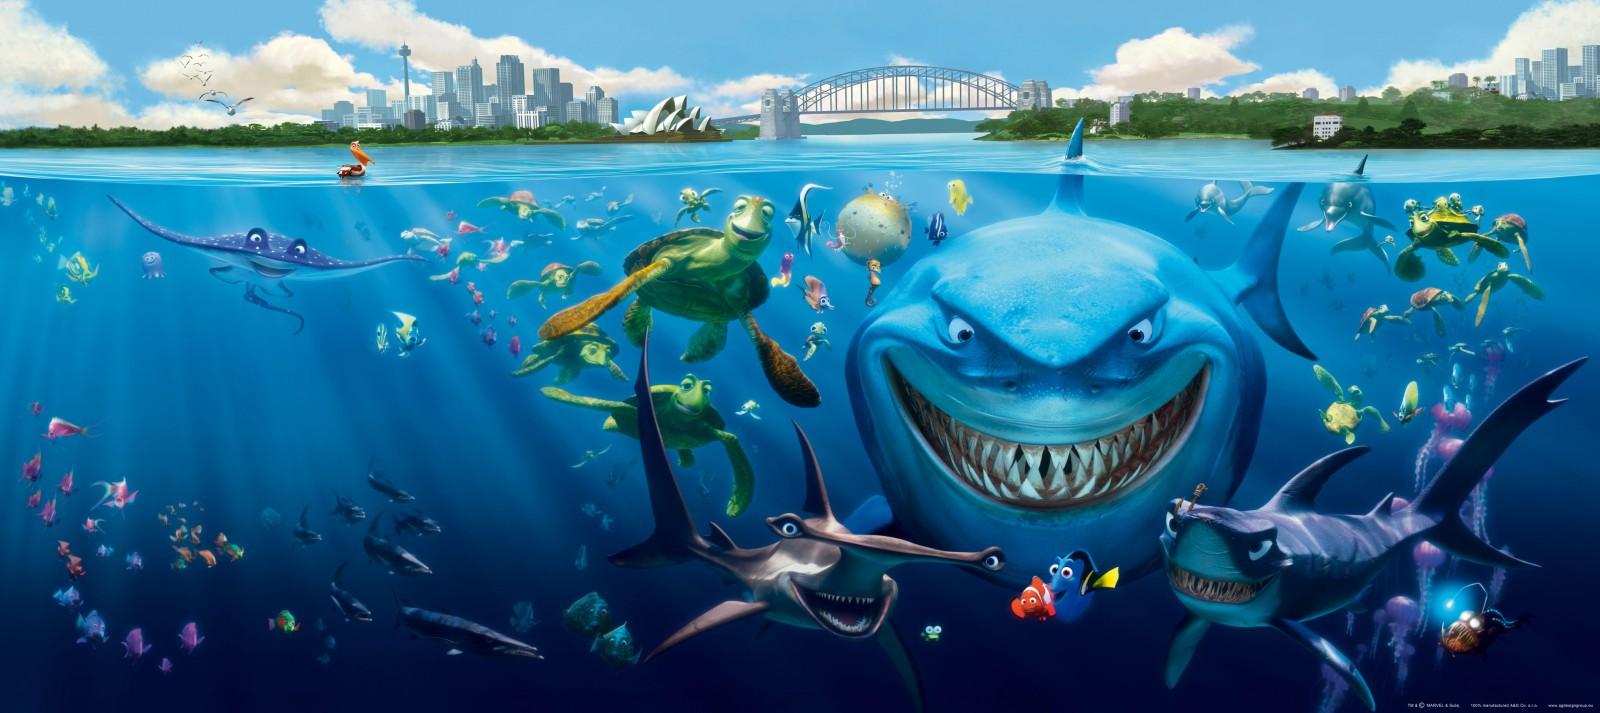 Finding Nemo D Animasi Hd Wallpaper: Wall Mural Wallpaper Finding Nemo 3 Sharks Bruce Anchor